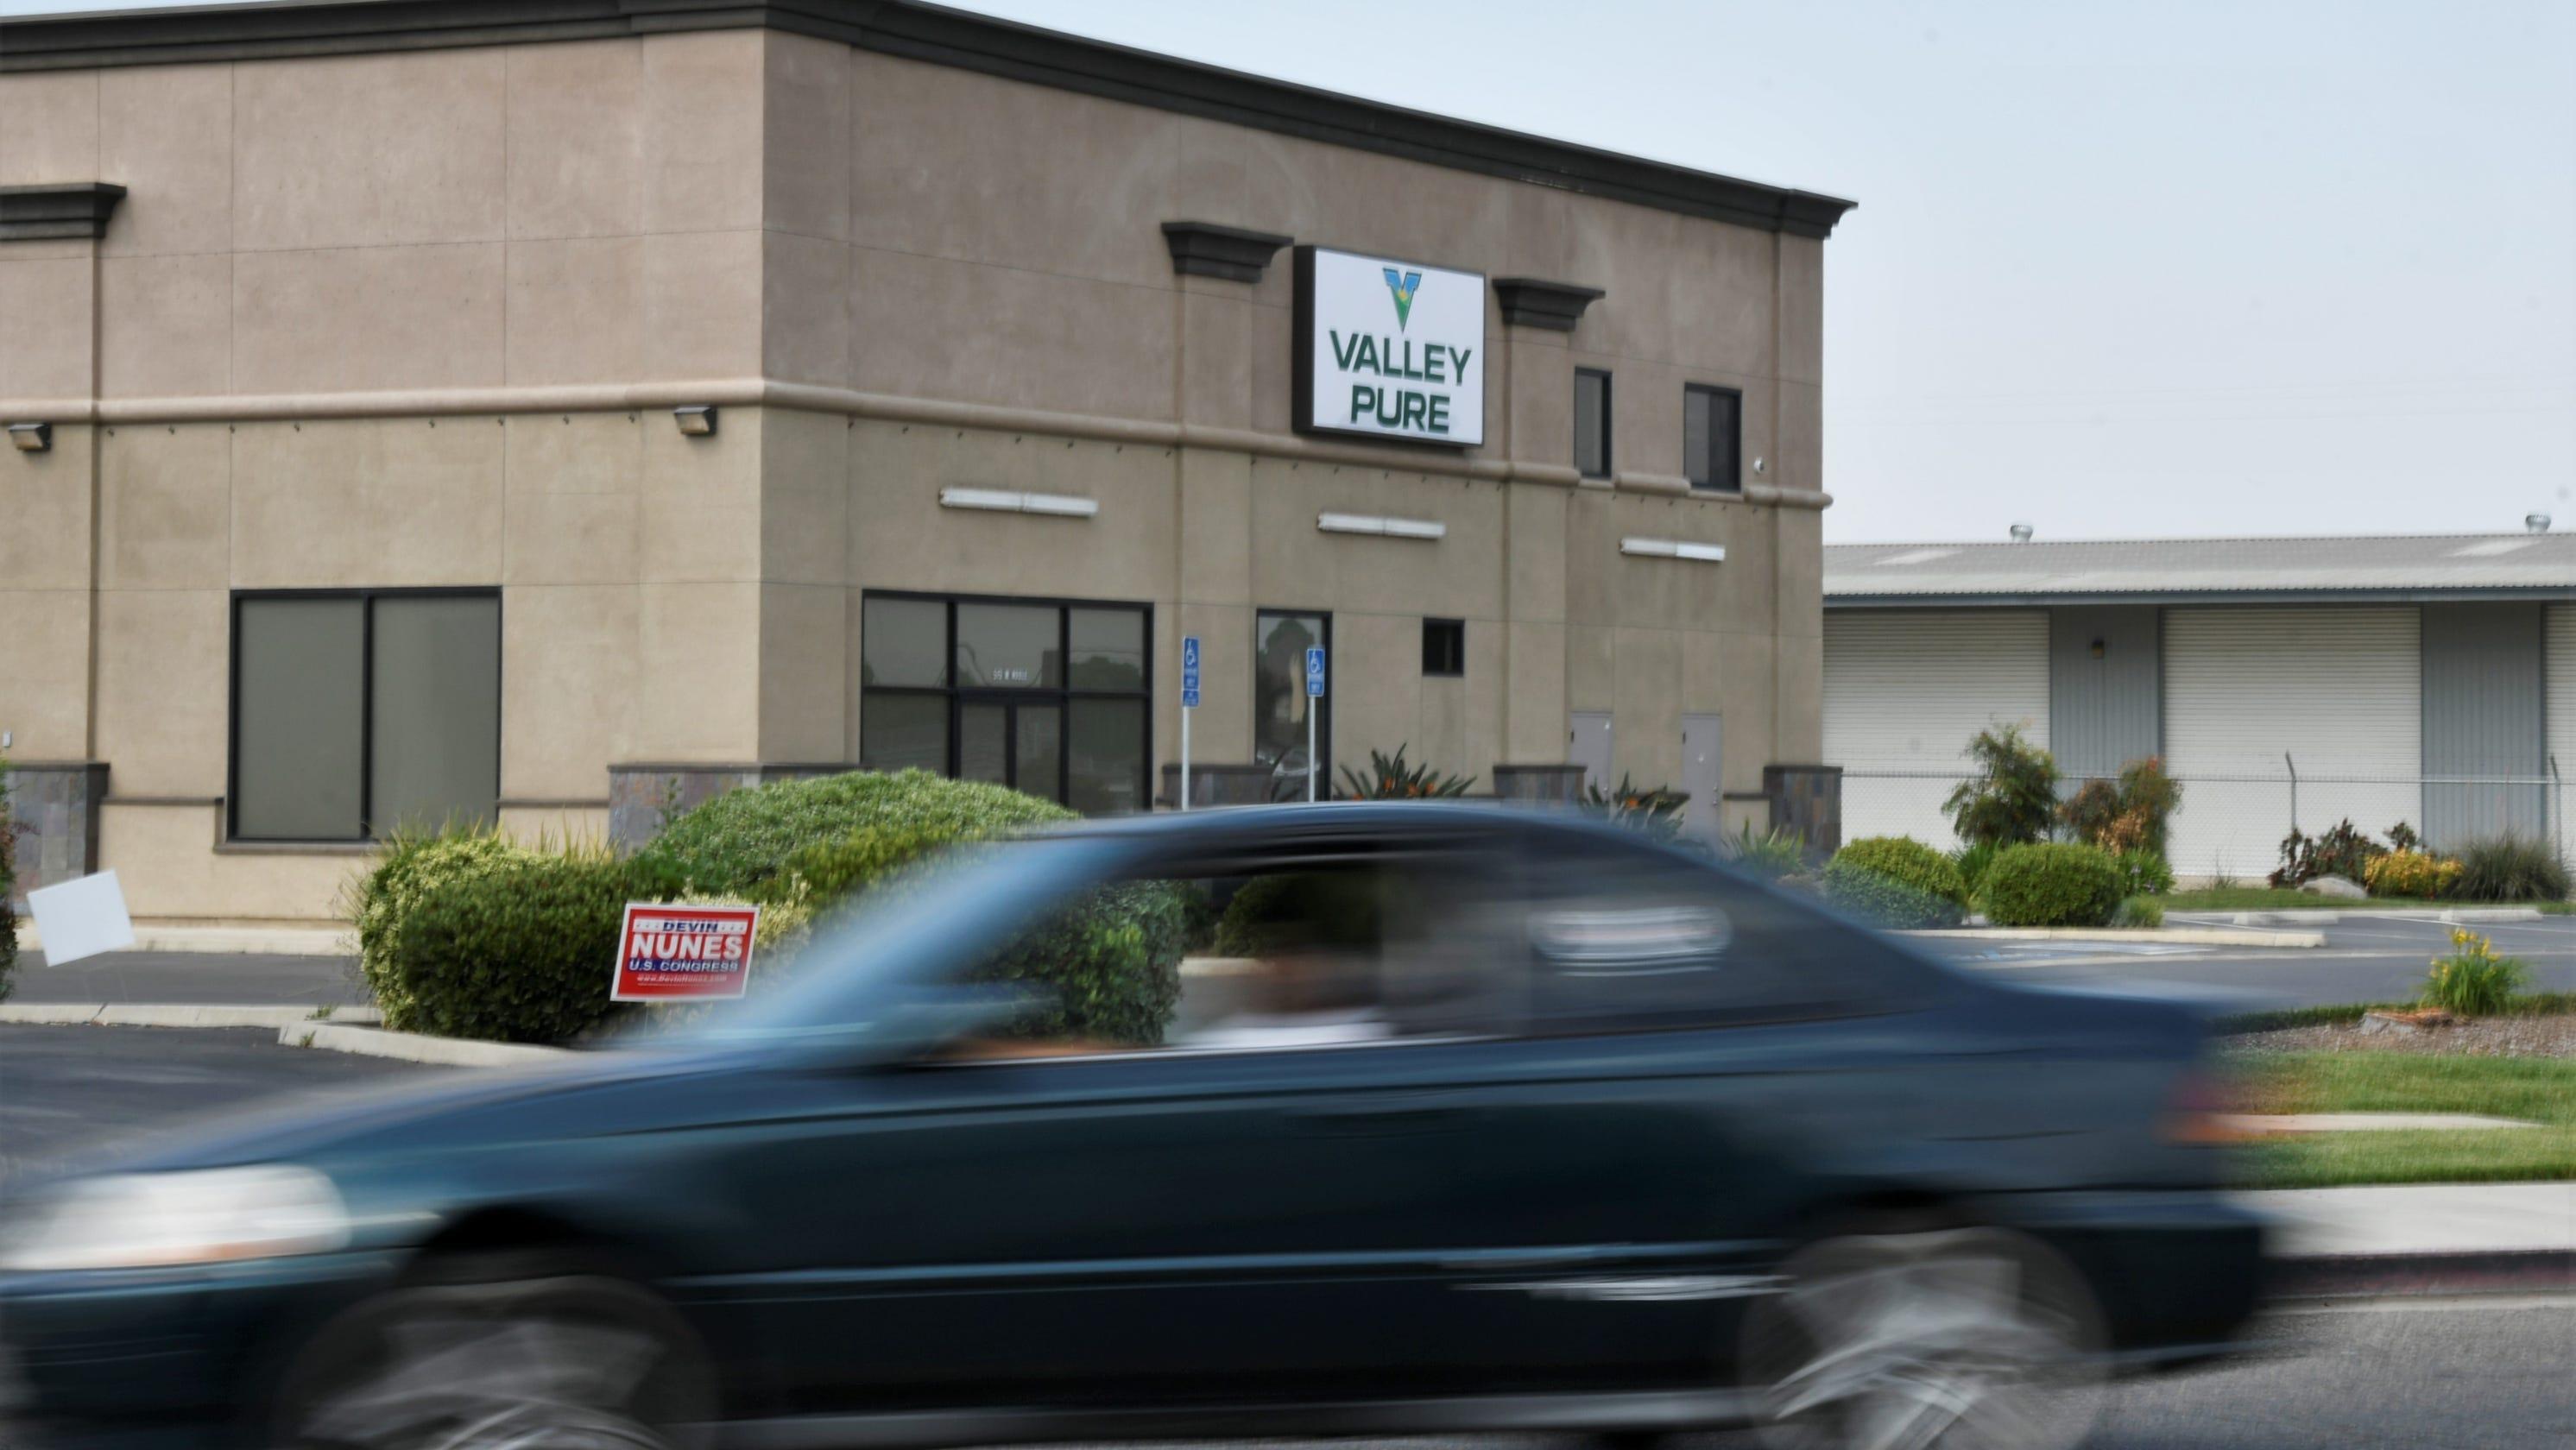 Farmersville will be home to three marijuana dispensaries